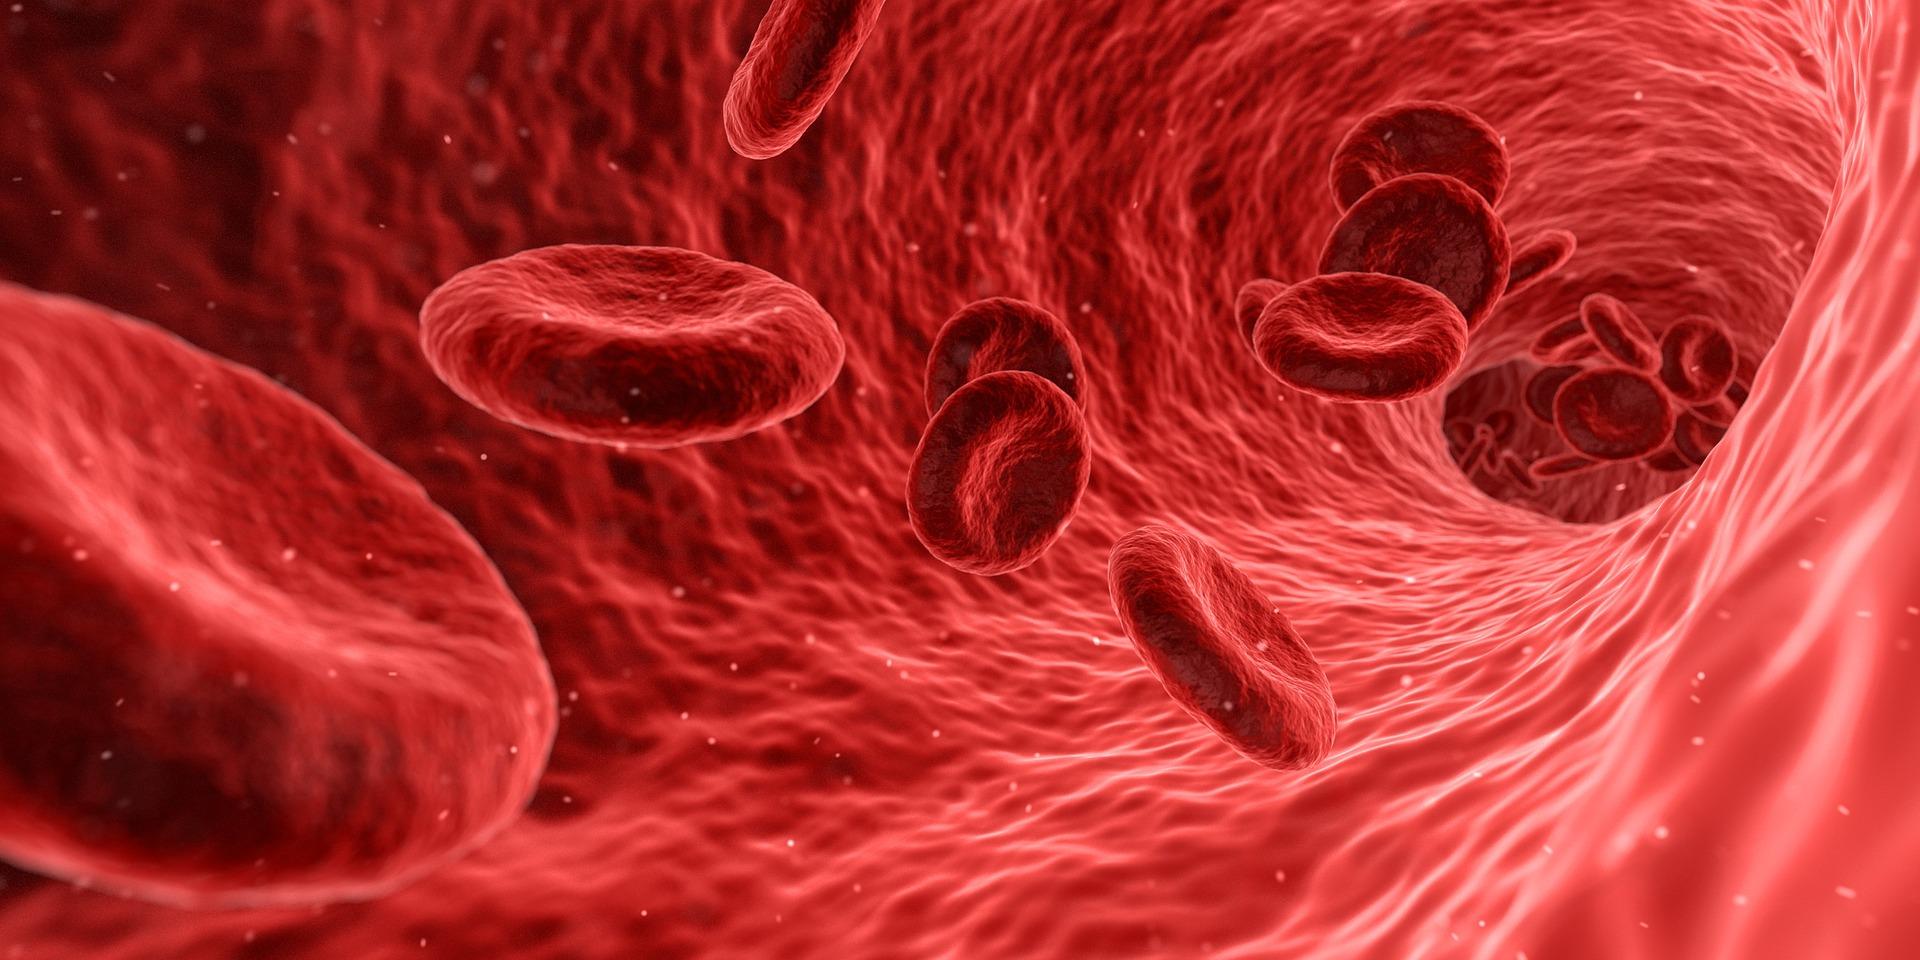 Apendicele si sistemul imunitar